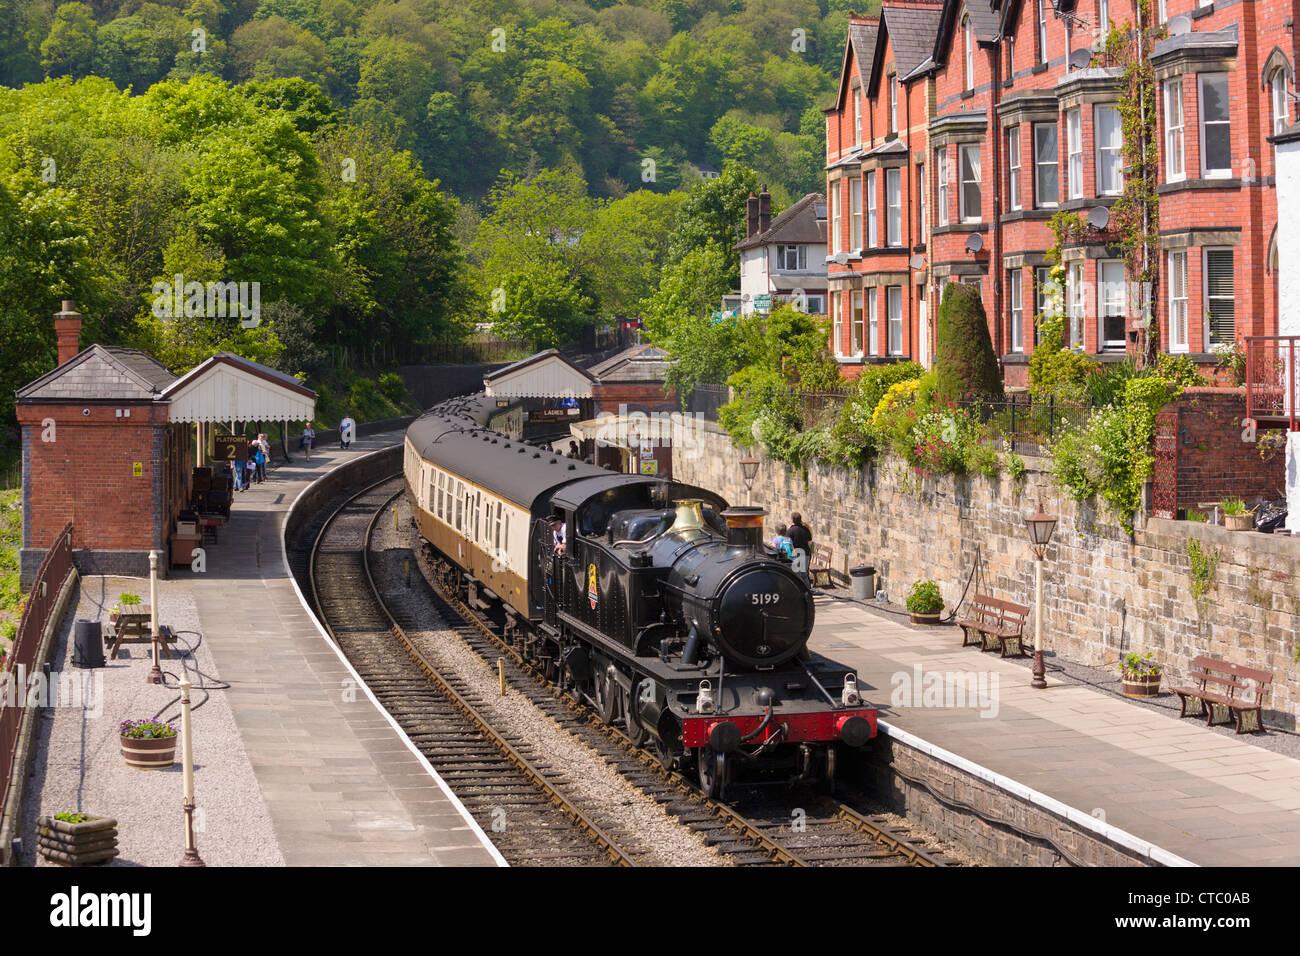 Llangollen steam train - Stock Image